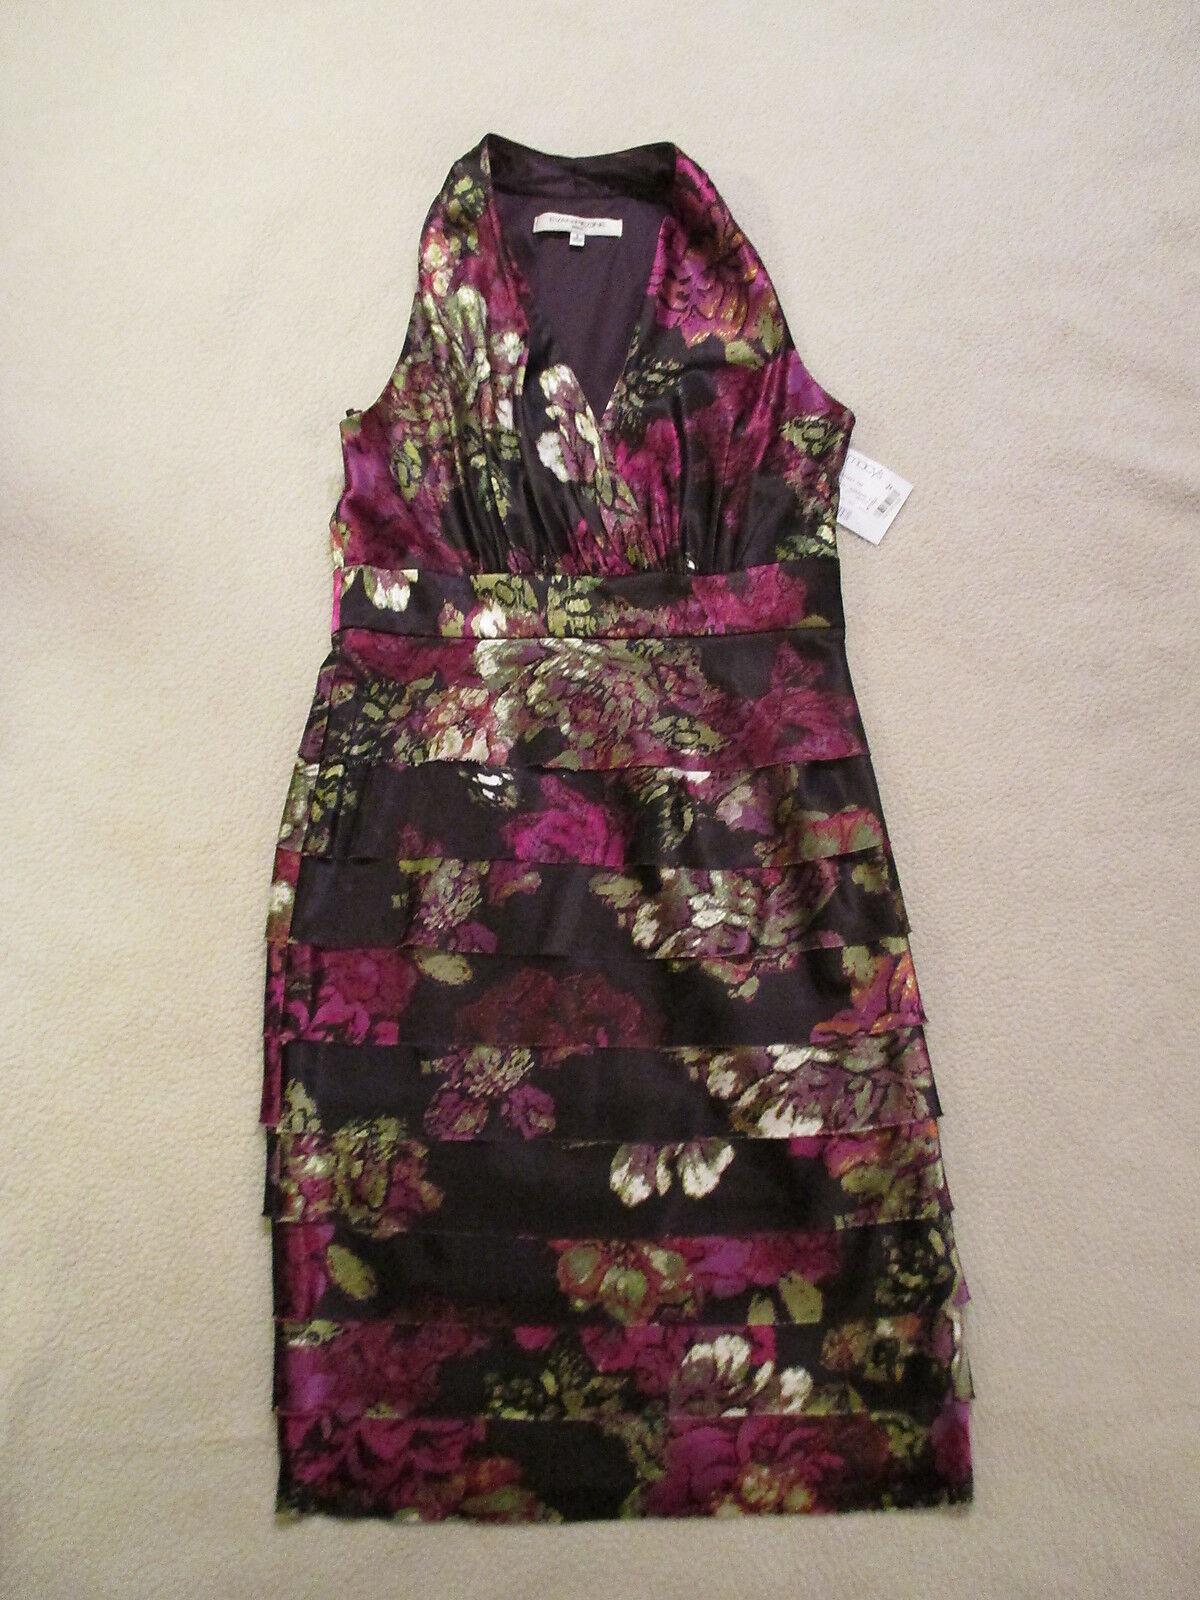 b7b2ae6d06eab7 NWOT Evan Picone Satiny SemiFormal Holiday Party Dress sz 8 lila Tierot  Floral